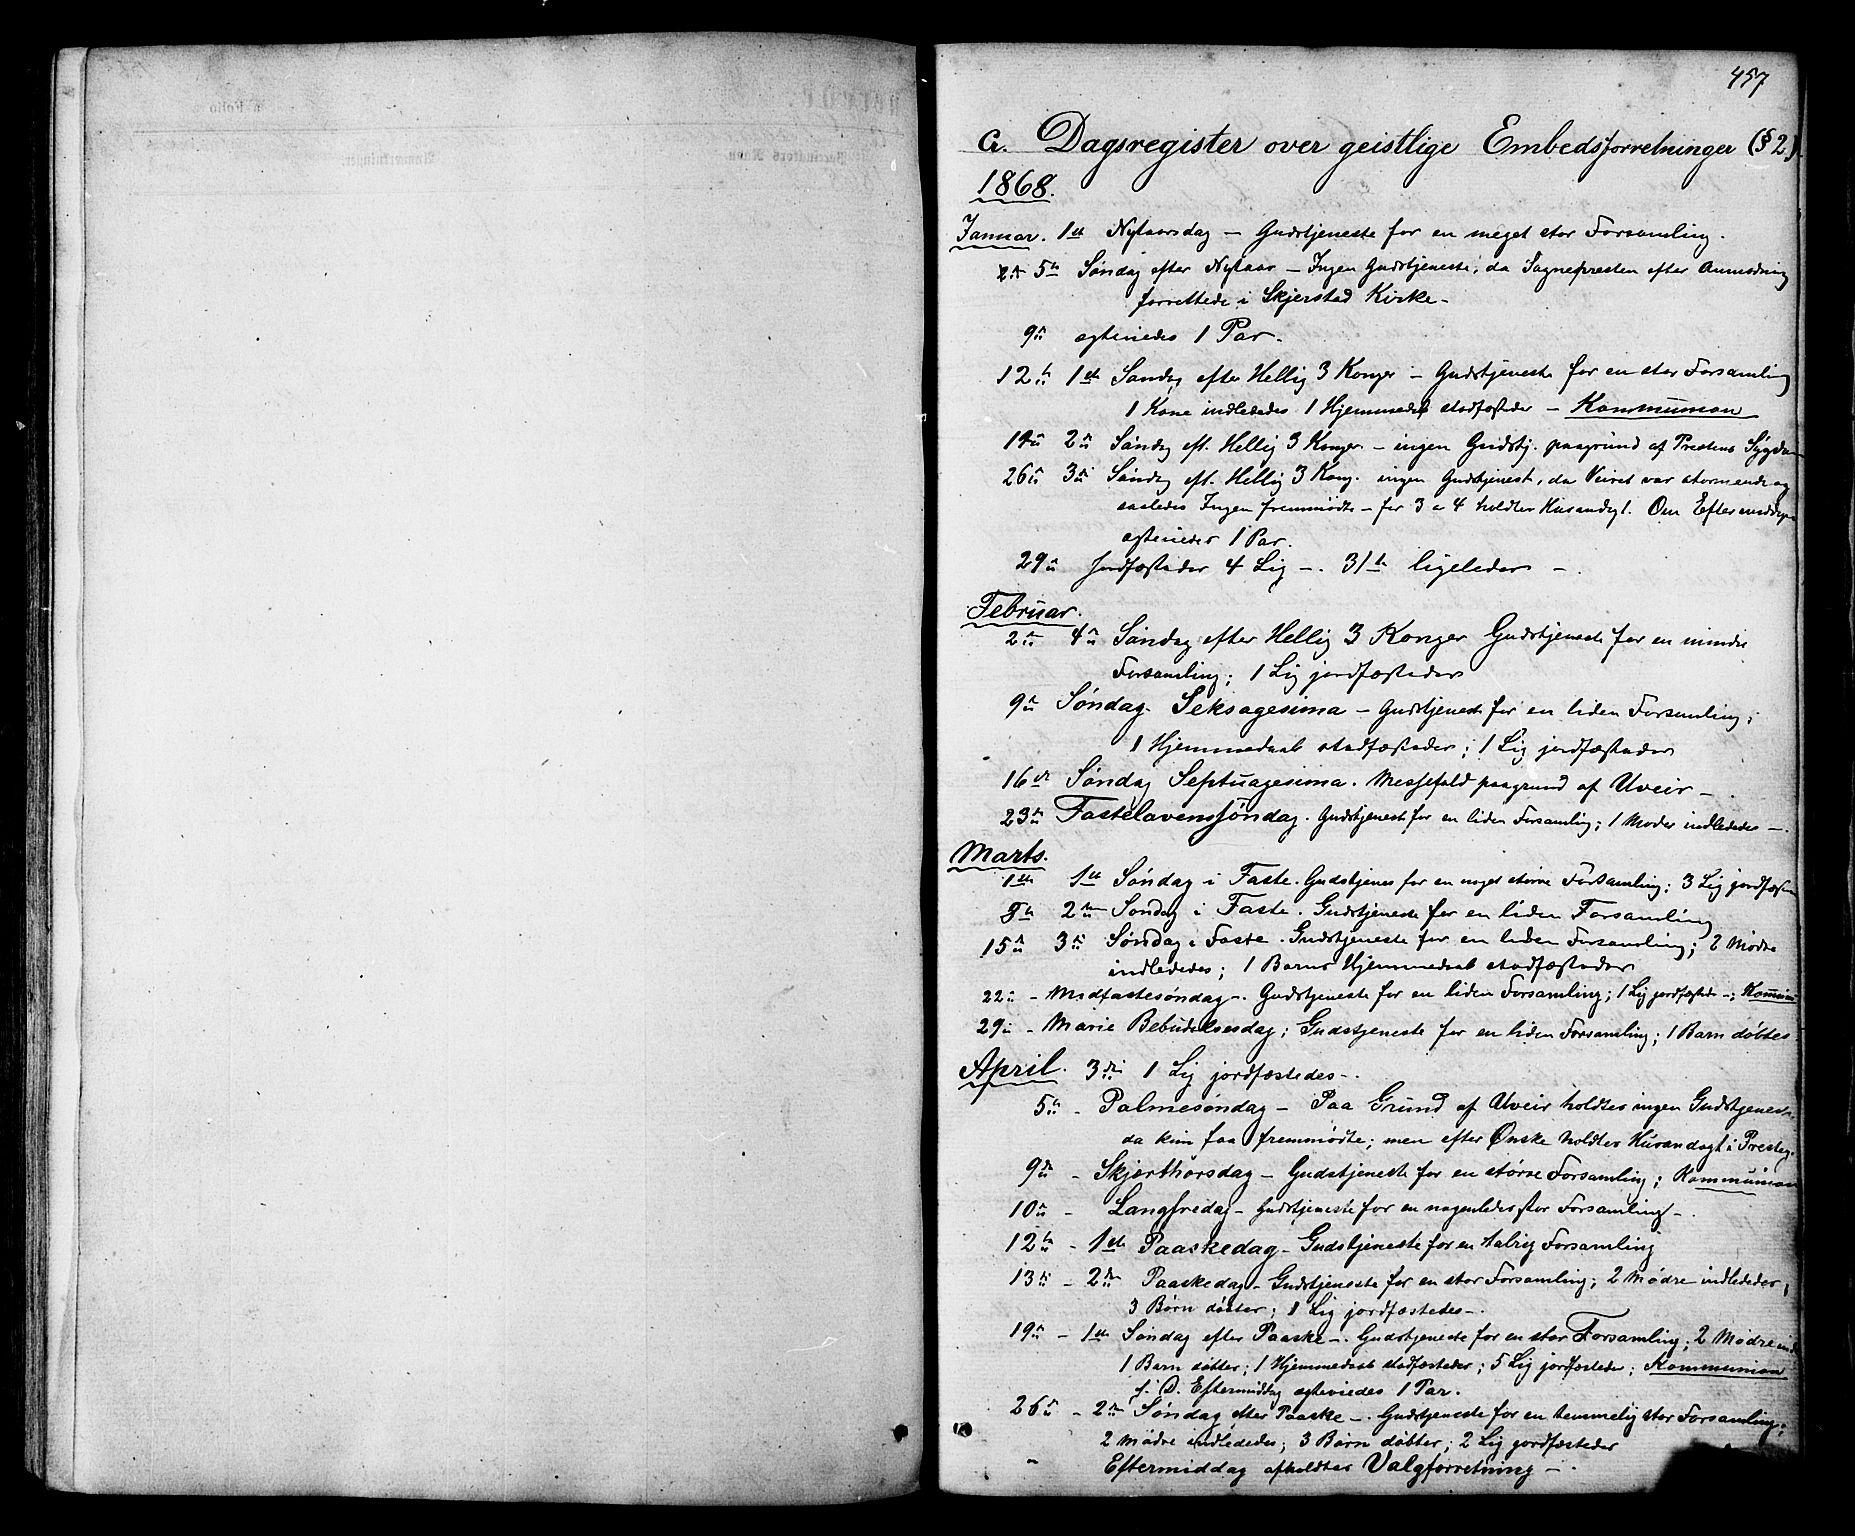 SAT, Ministerialprotokoller, klokkerbøker og fødselsregistre - Nordland, 801/L0029: Klokkerbok nr. 801C04, 1868-1878, s. 457